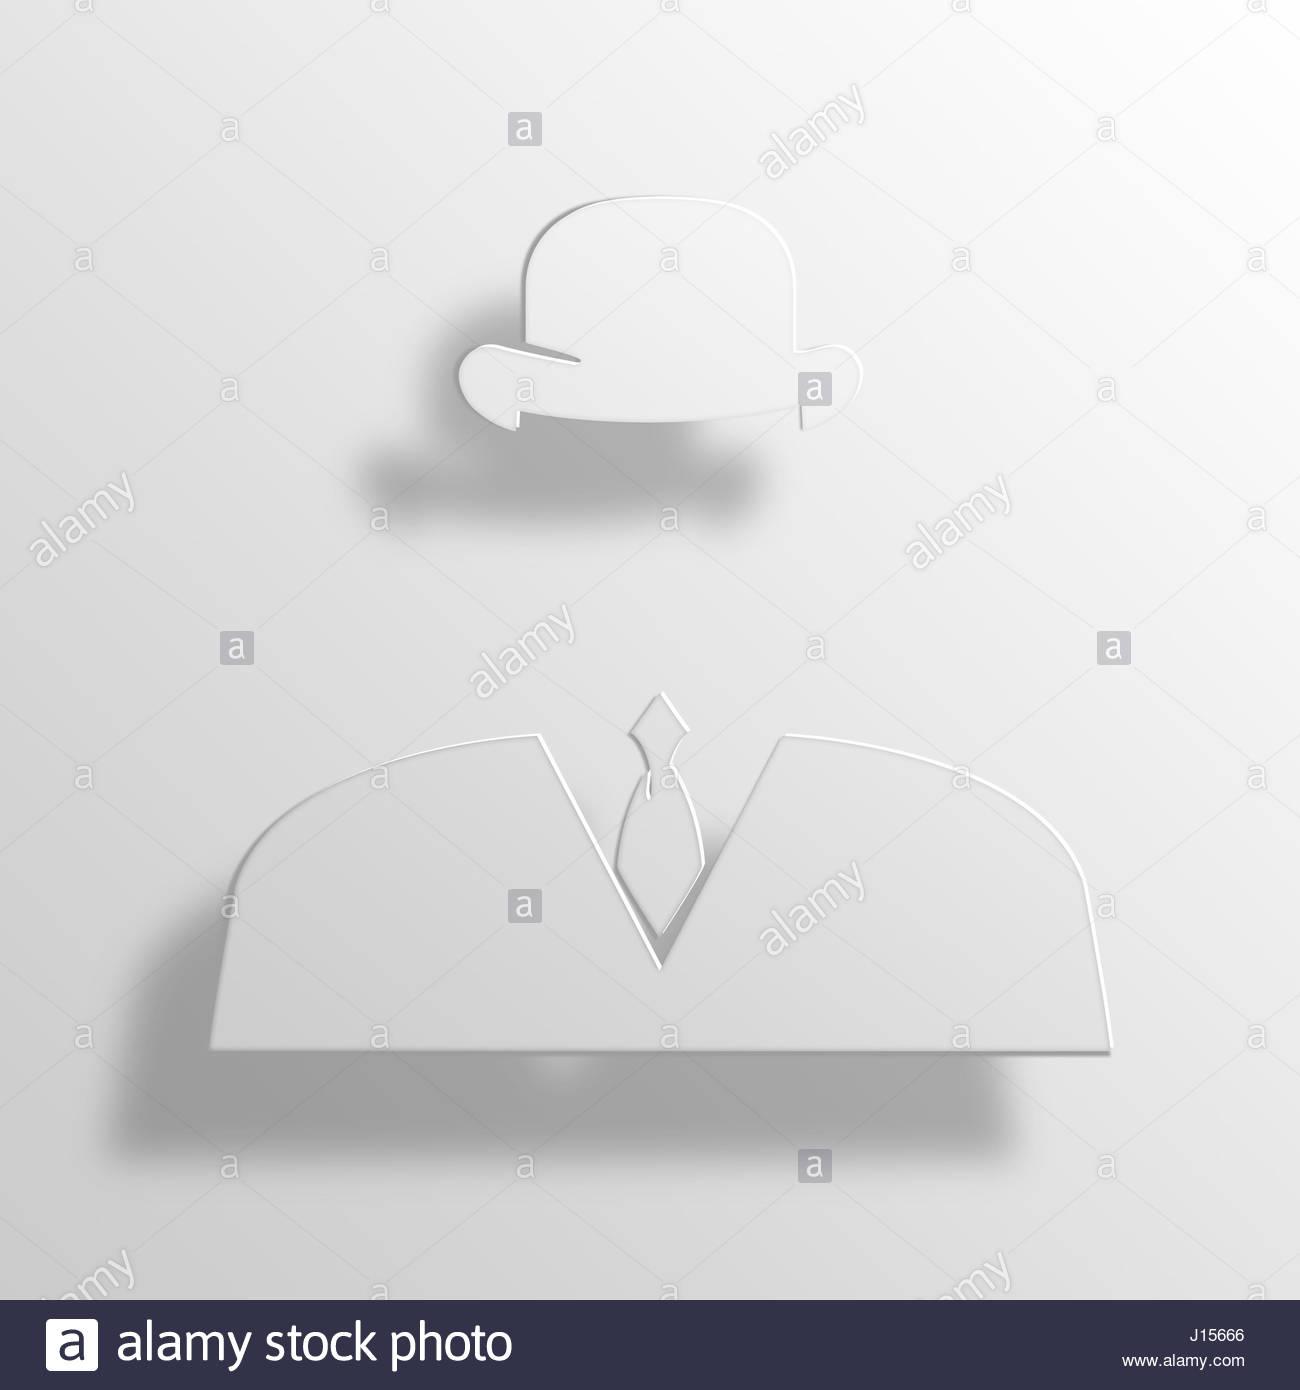 Invisible 3d Paper Icon Symbol Business Concept No554 Stock Photo